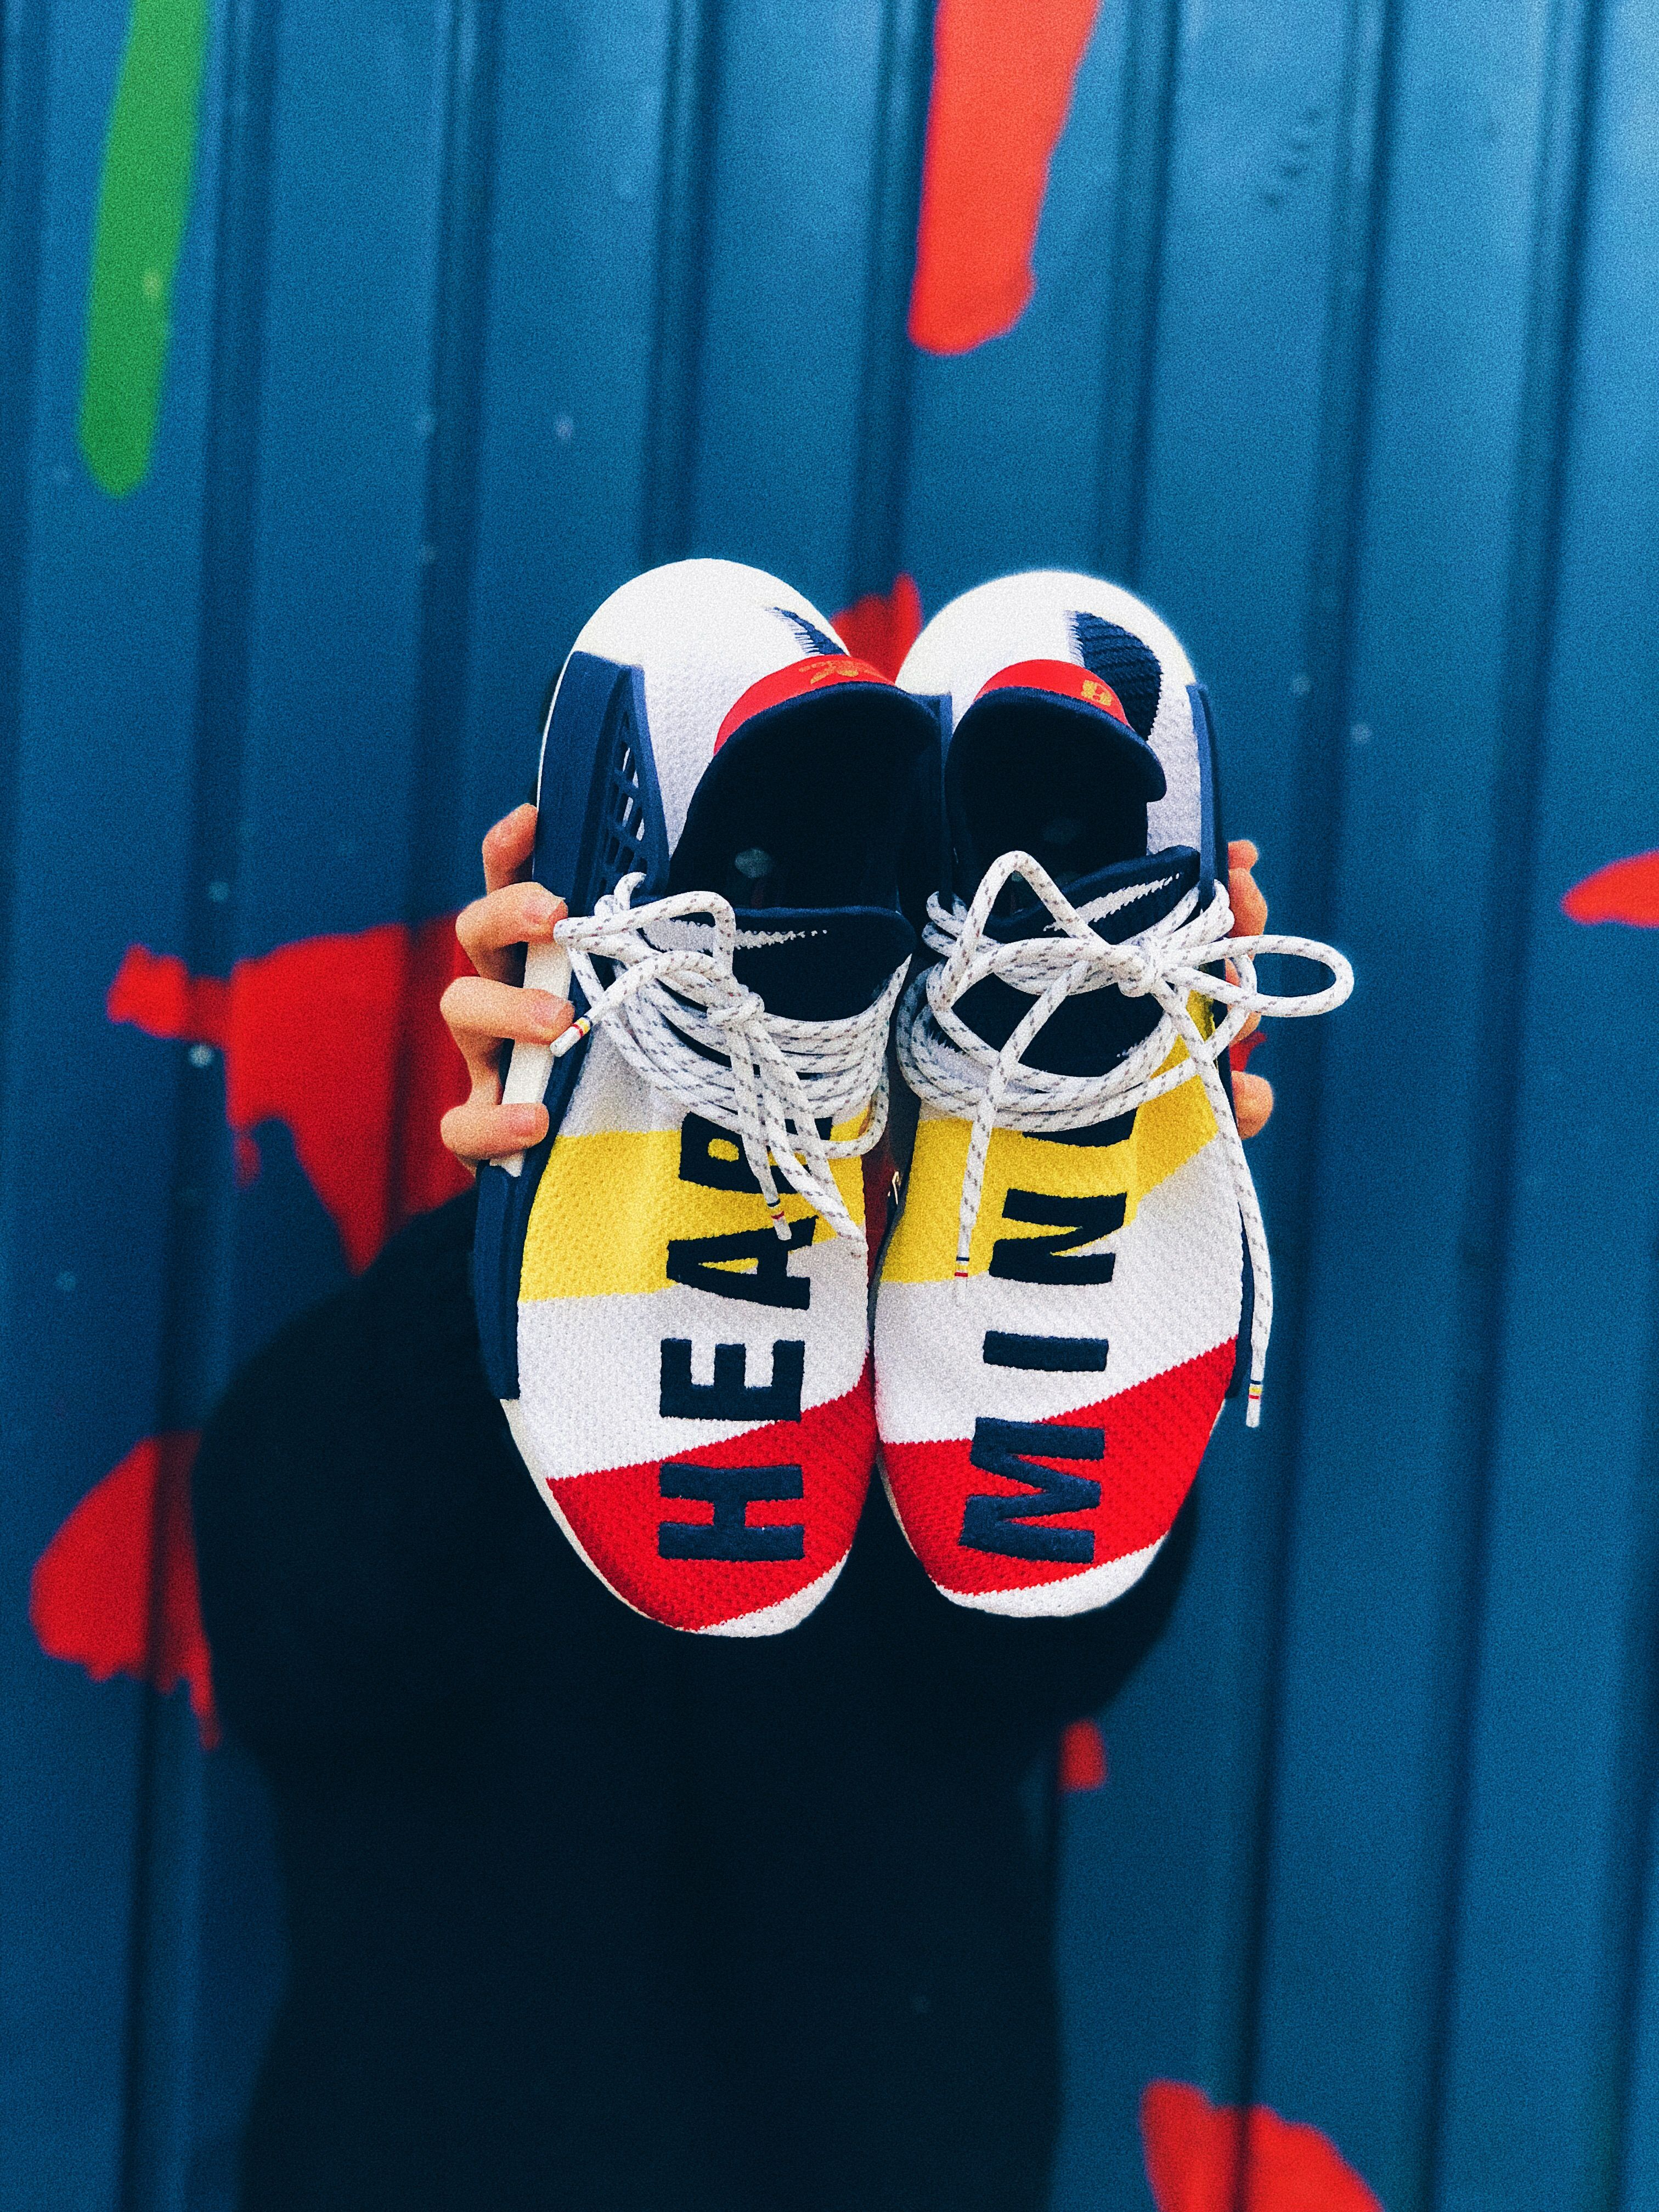 9e07d0f1b Wir lieben die Farbenvielfalt des neuen adidas x BBC x Pharrell Williams  Human Race!  sneaker  adidas  bbc  pw  pharrellwilliams  pharrell   humanrace ...